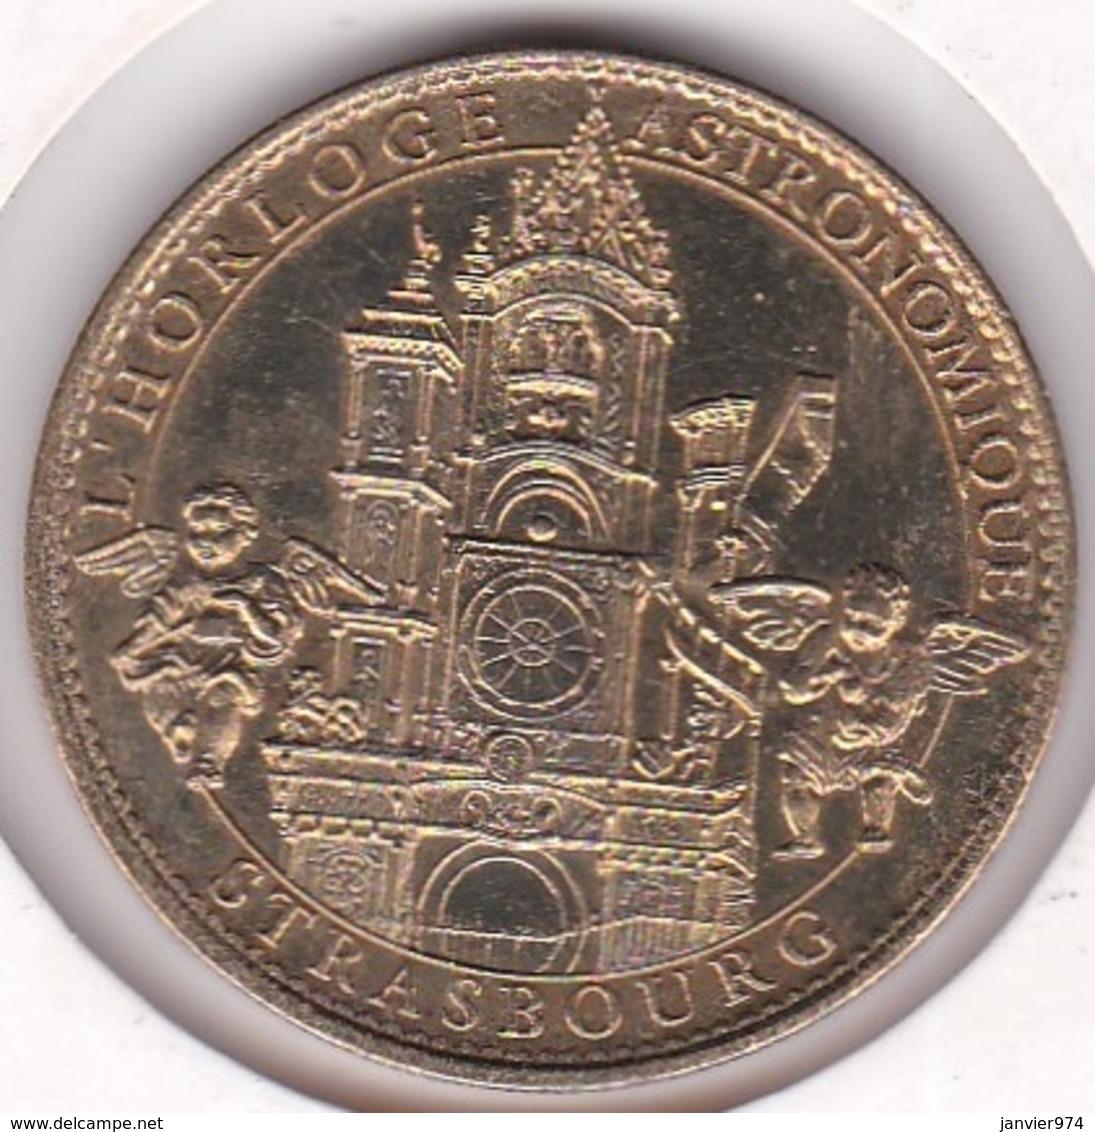 Cathédrale De Strasbourg Horloge Astronomique 2007. Arthus Bertrand - Arthus Bertrand